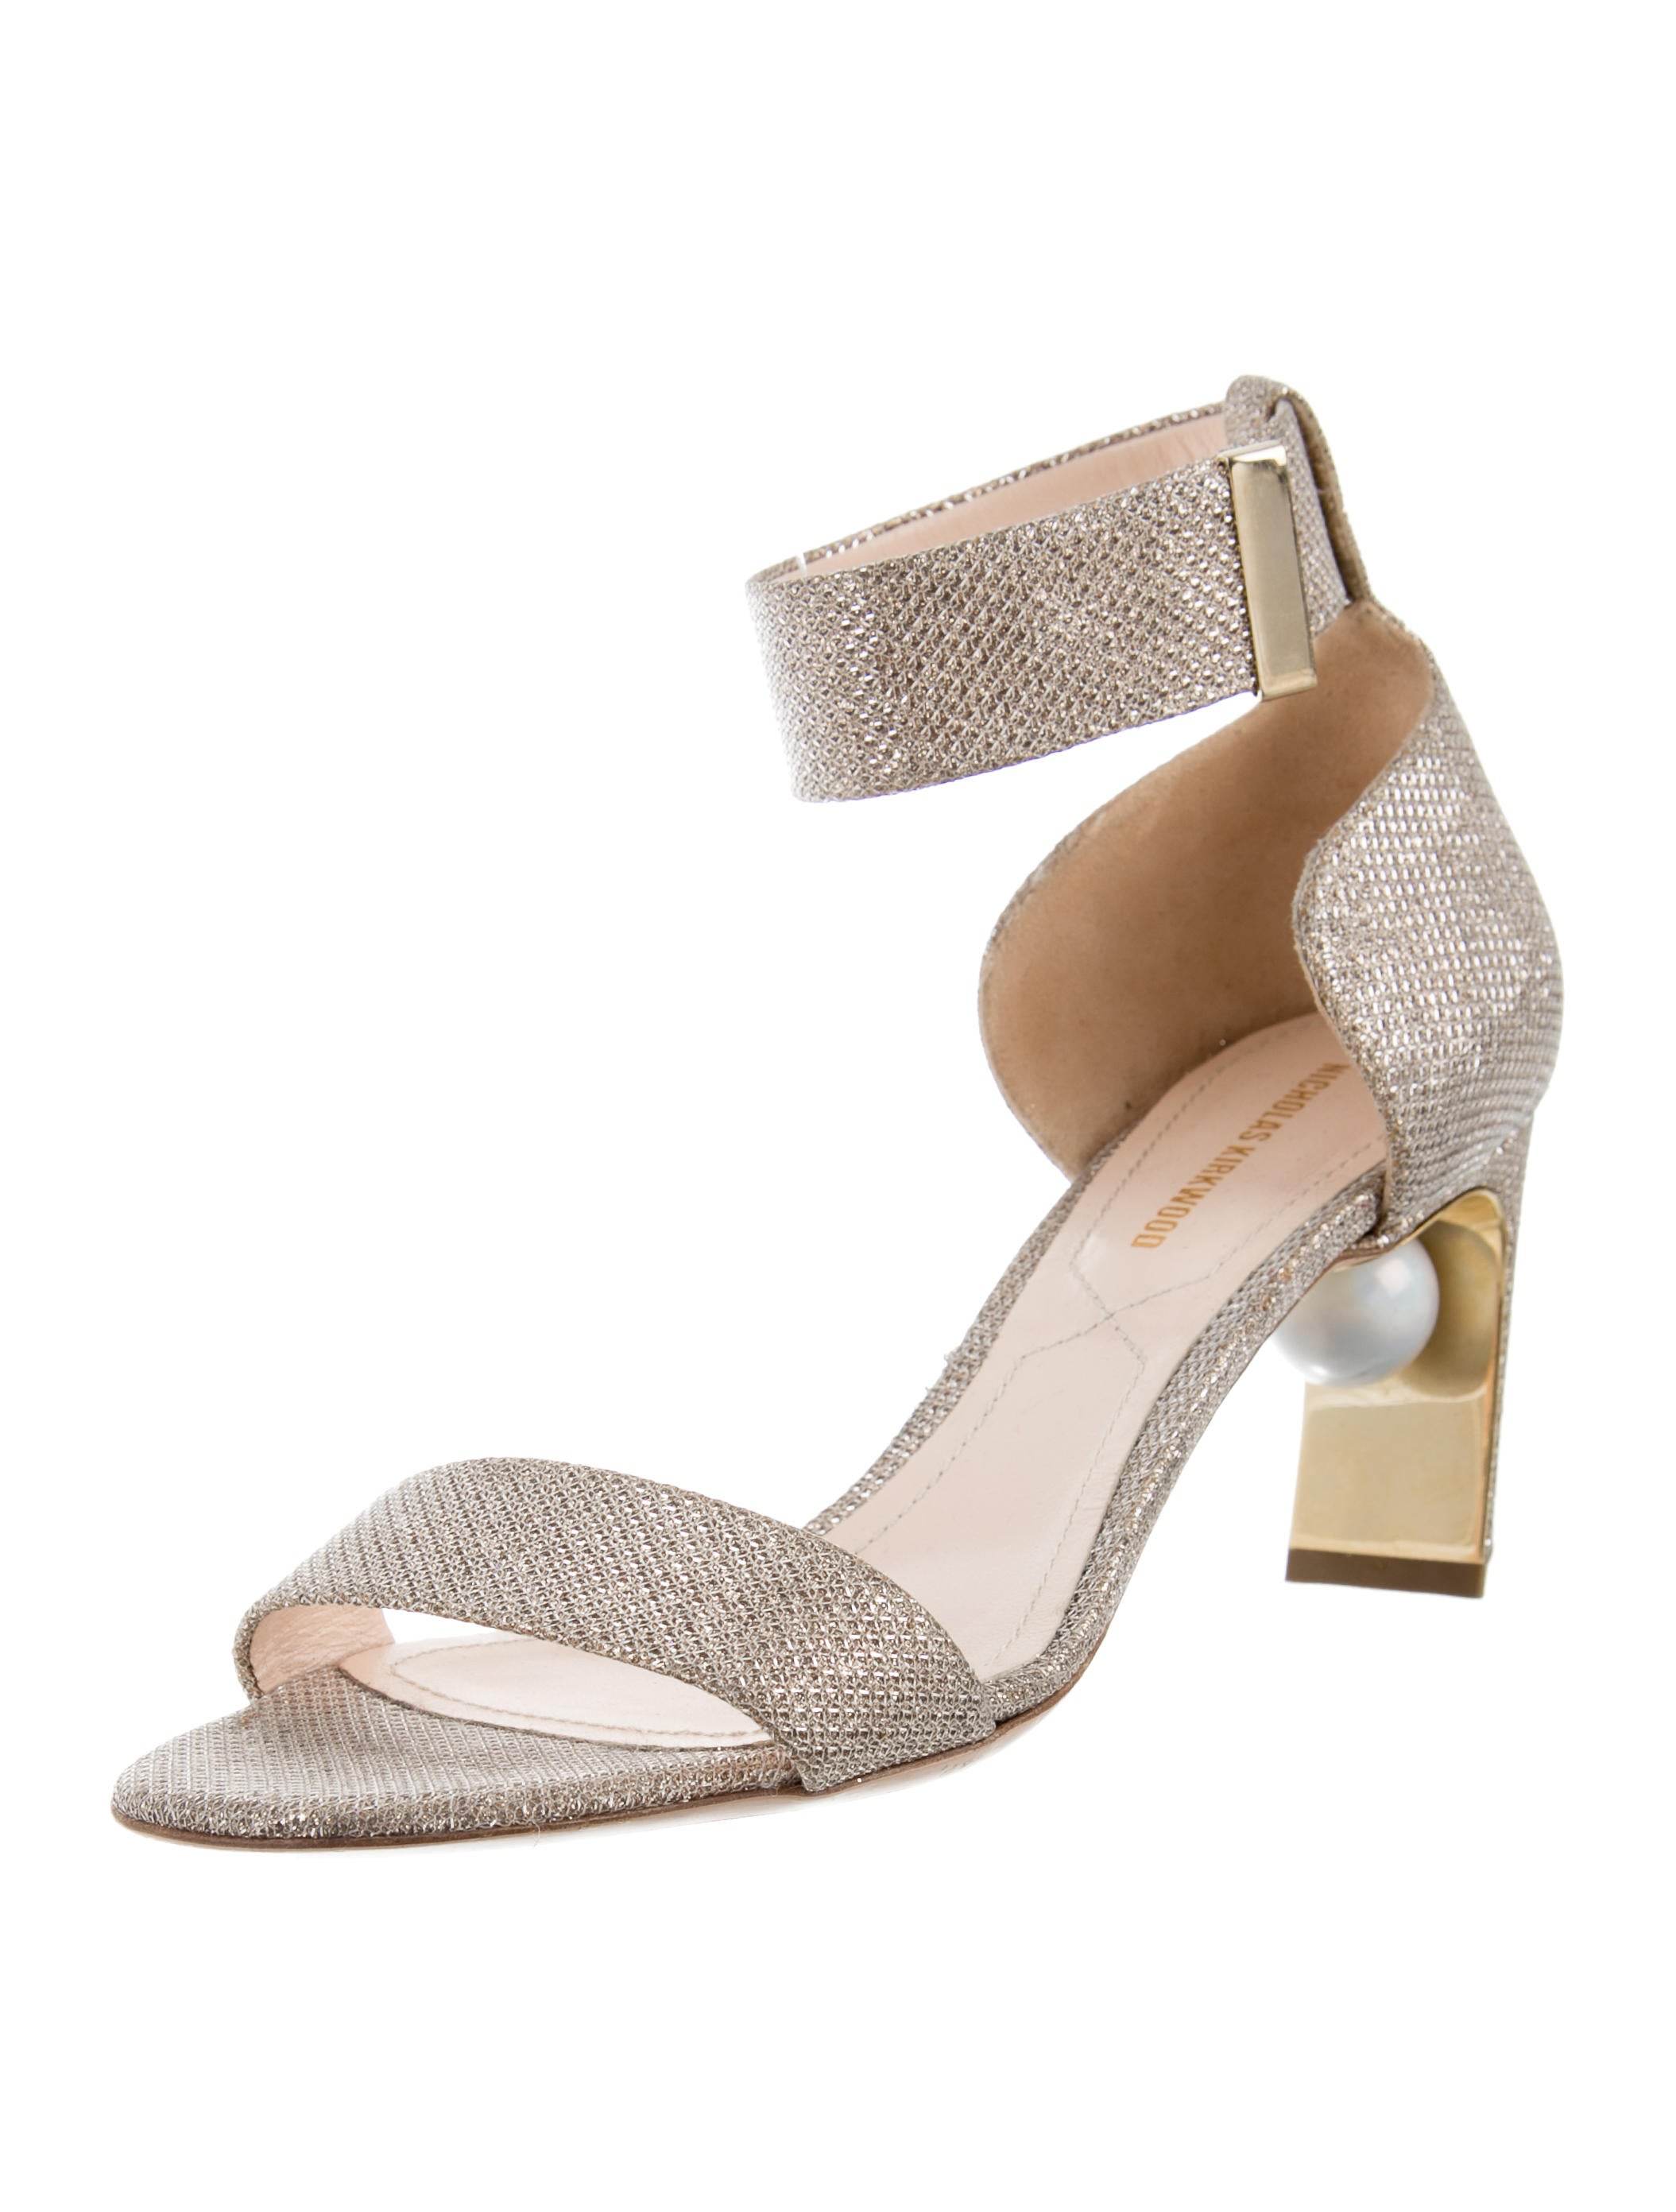 Nicholas Kirkwood Glitter Round-Toe Sandals free shipping footlocker pictures sale pre order RAvRx